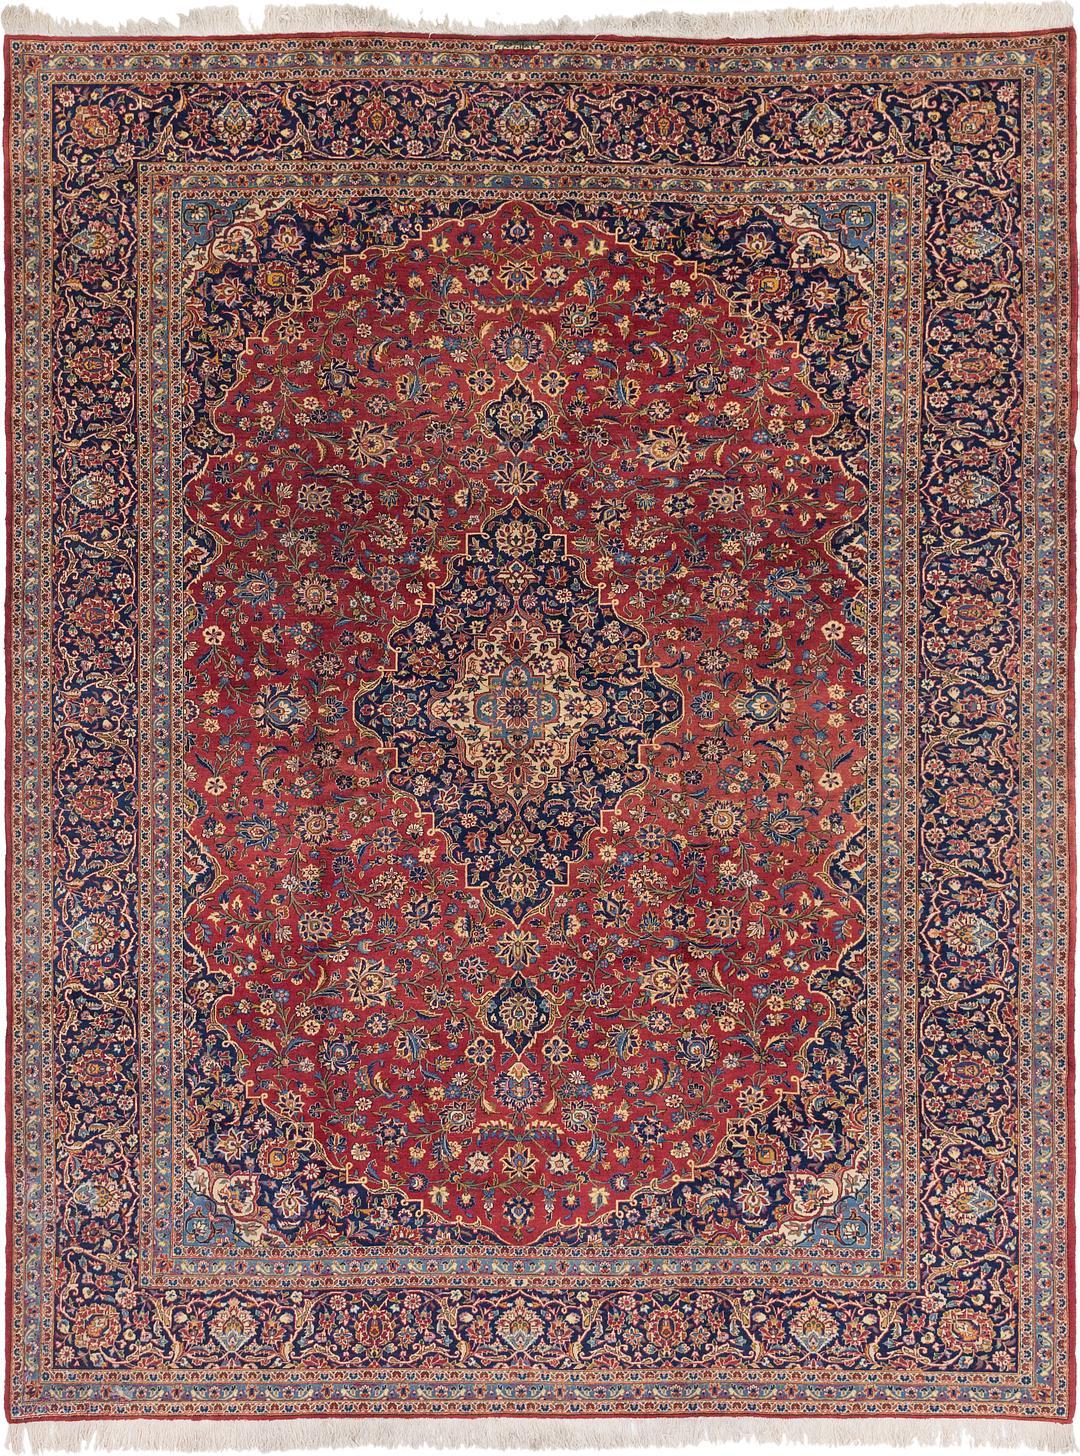 10 by 12 rug. Main Unique Loom 9\u0027 10 X 12\u0027 Kashan Persian Rug Photo By 12 E